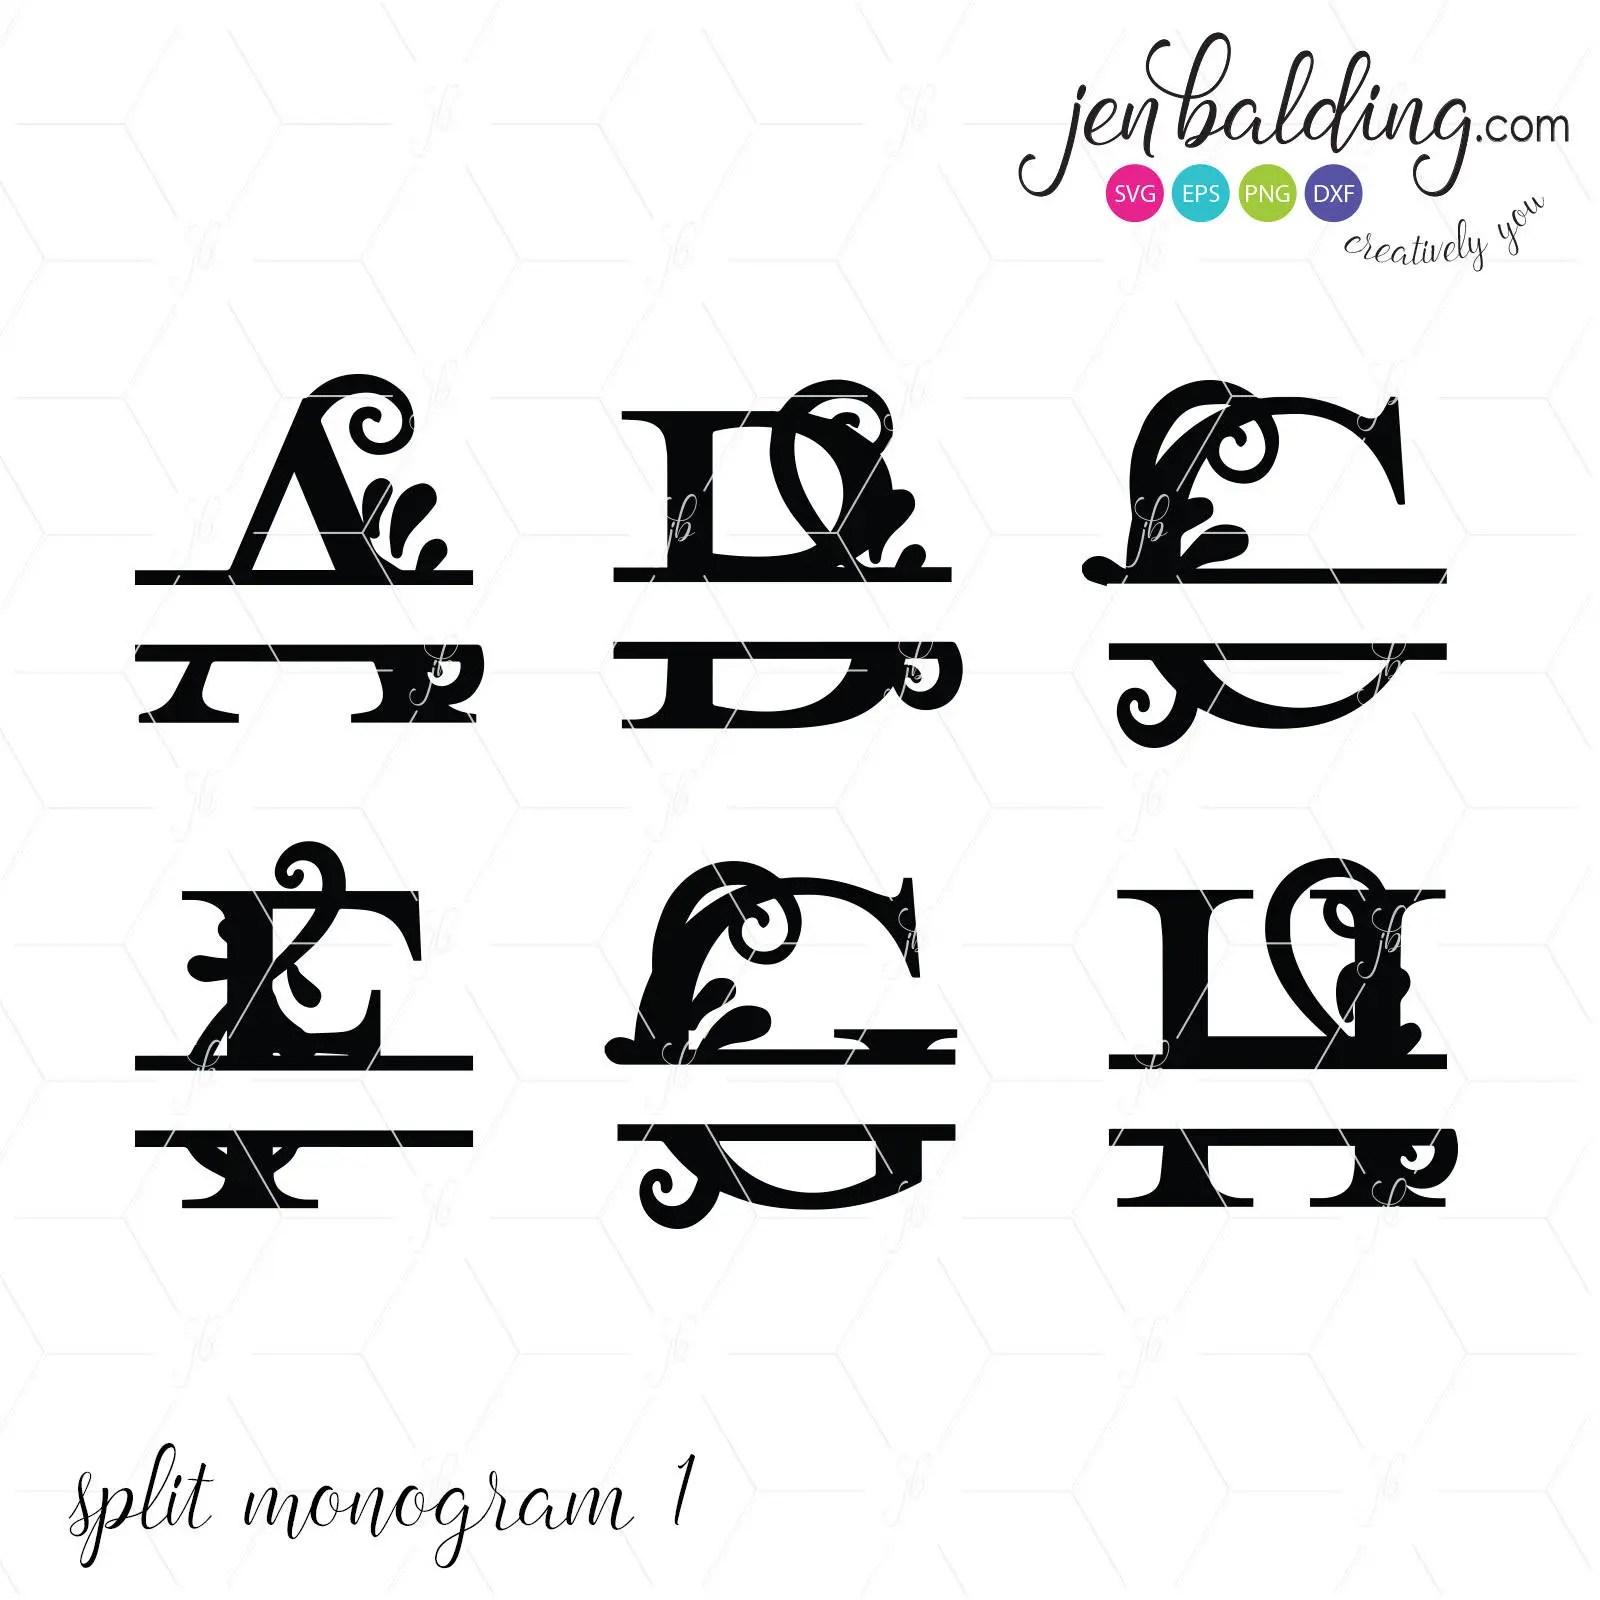 Split Letter Svg Split Letter Dxf Split Letter